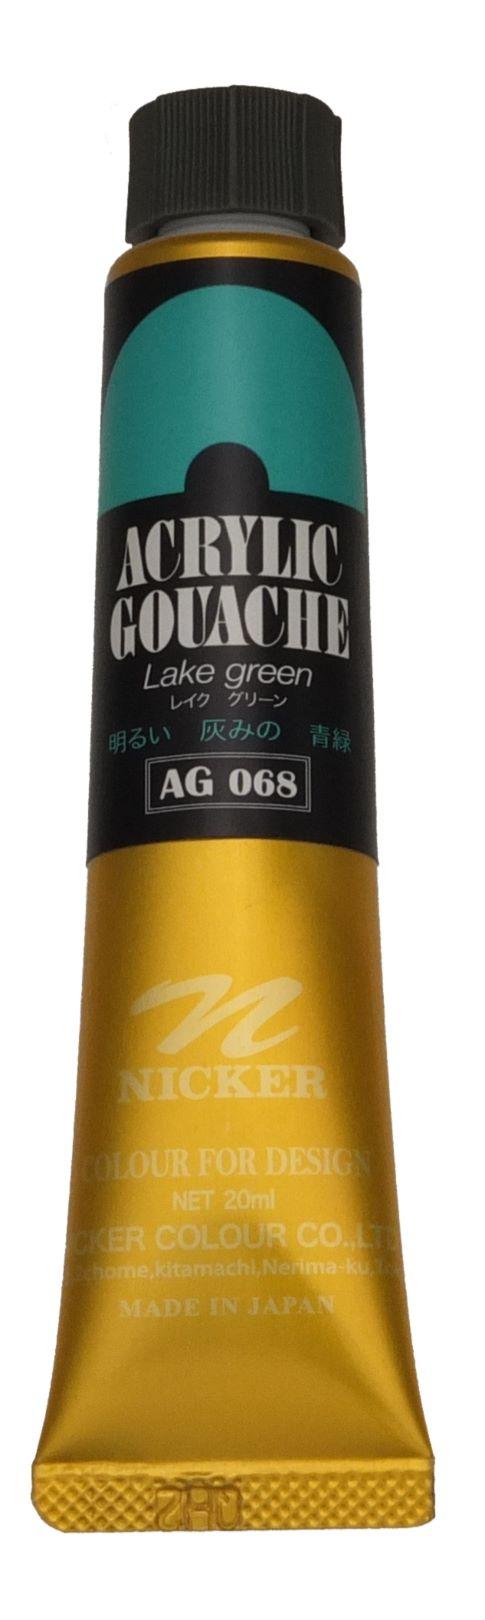 ACRYLIC GOUACHE 20ml AG068 LAKE GREEN